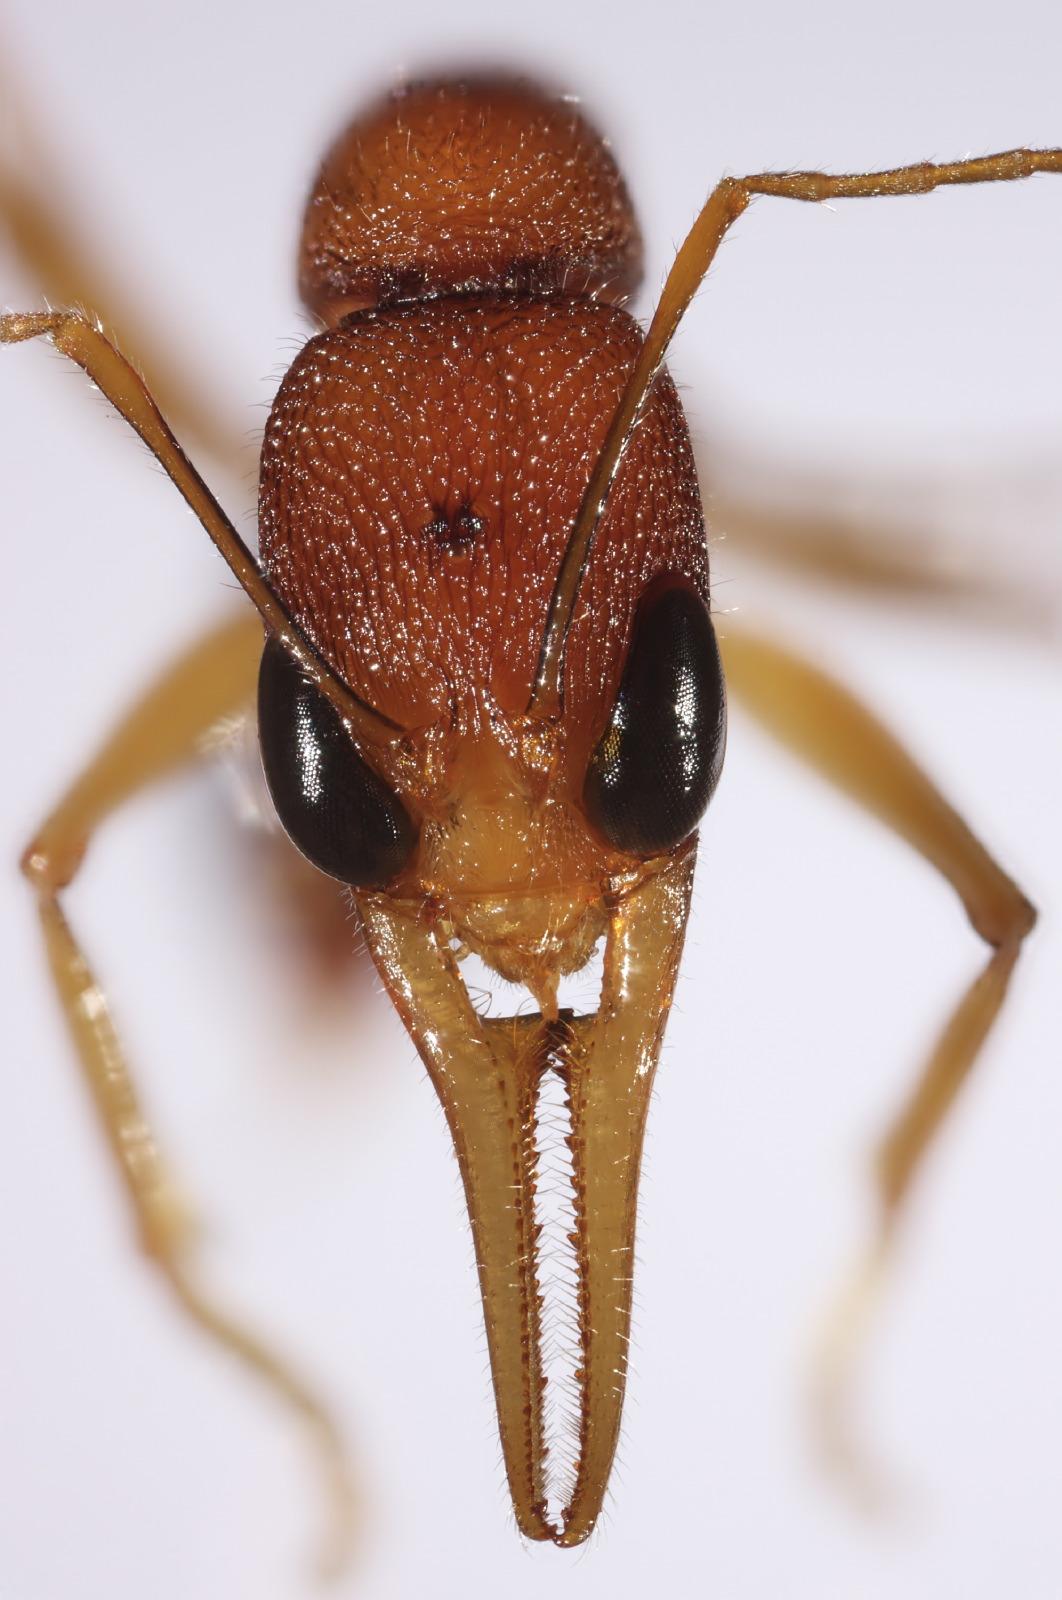 Harpegnathos ant portrait frontal 2